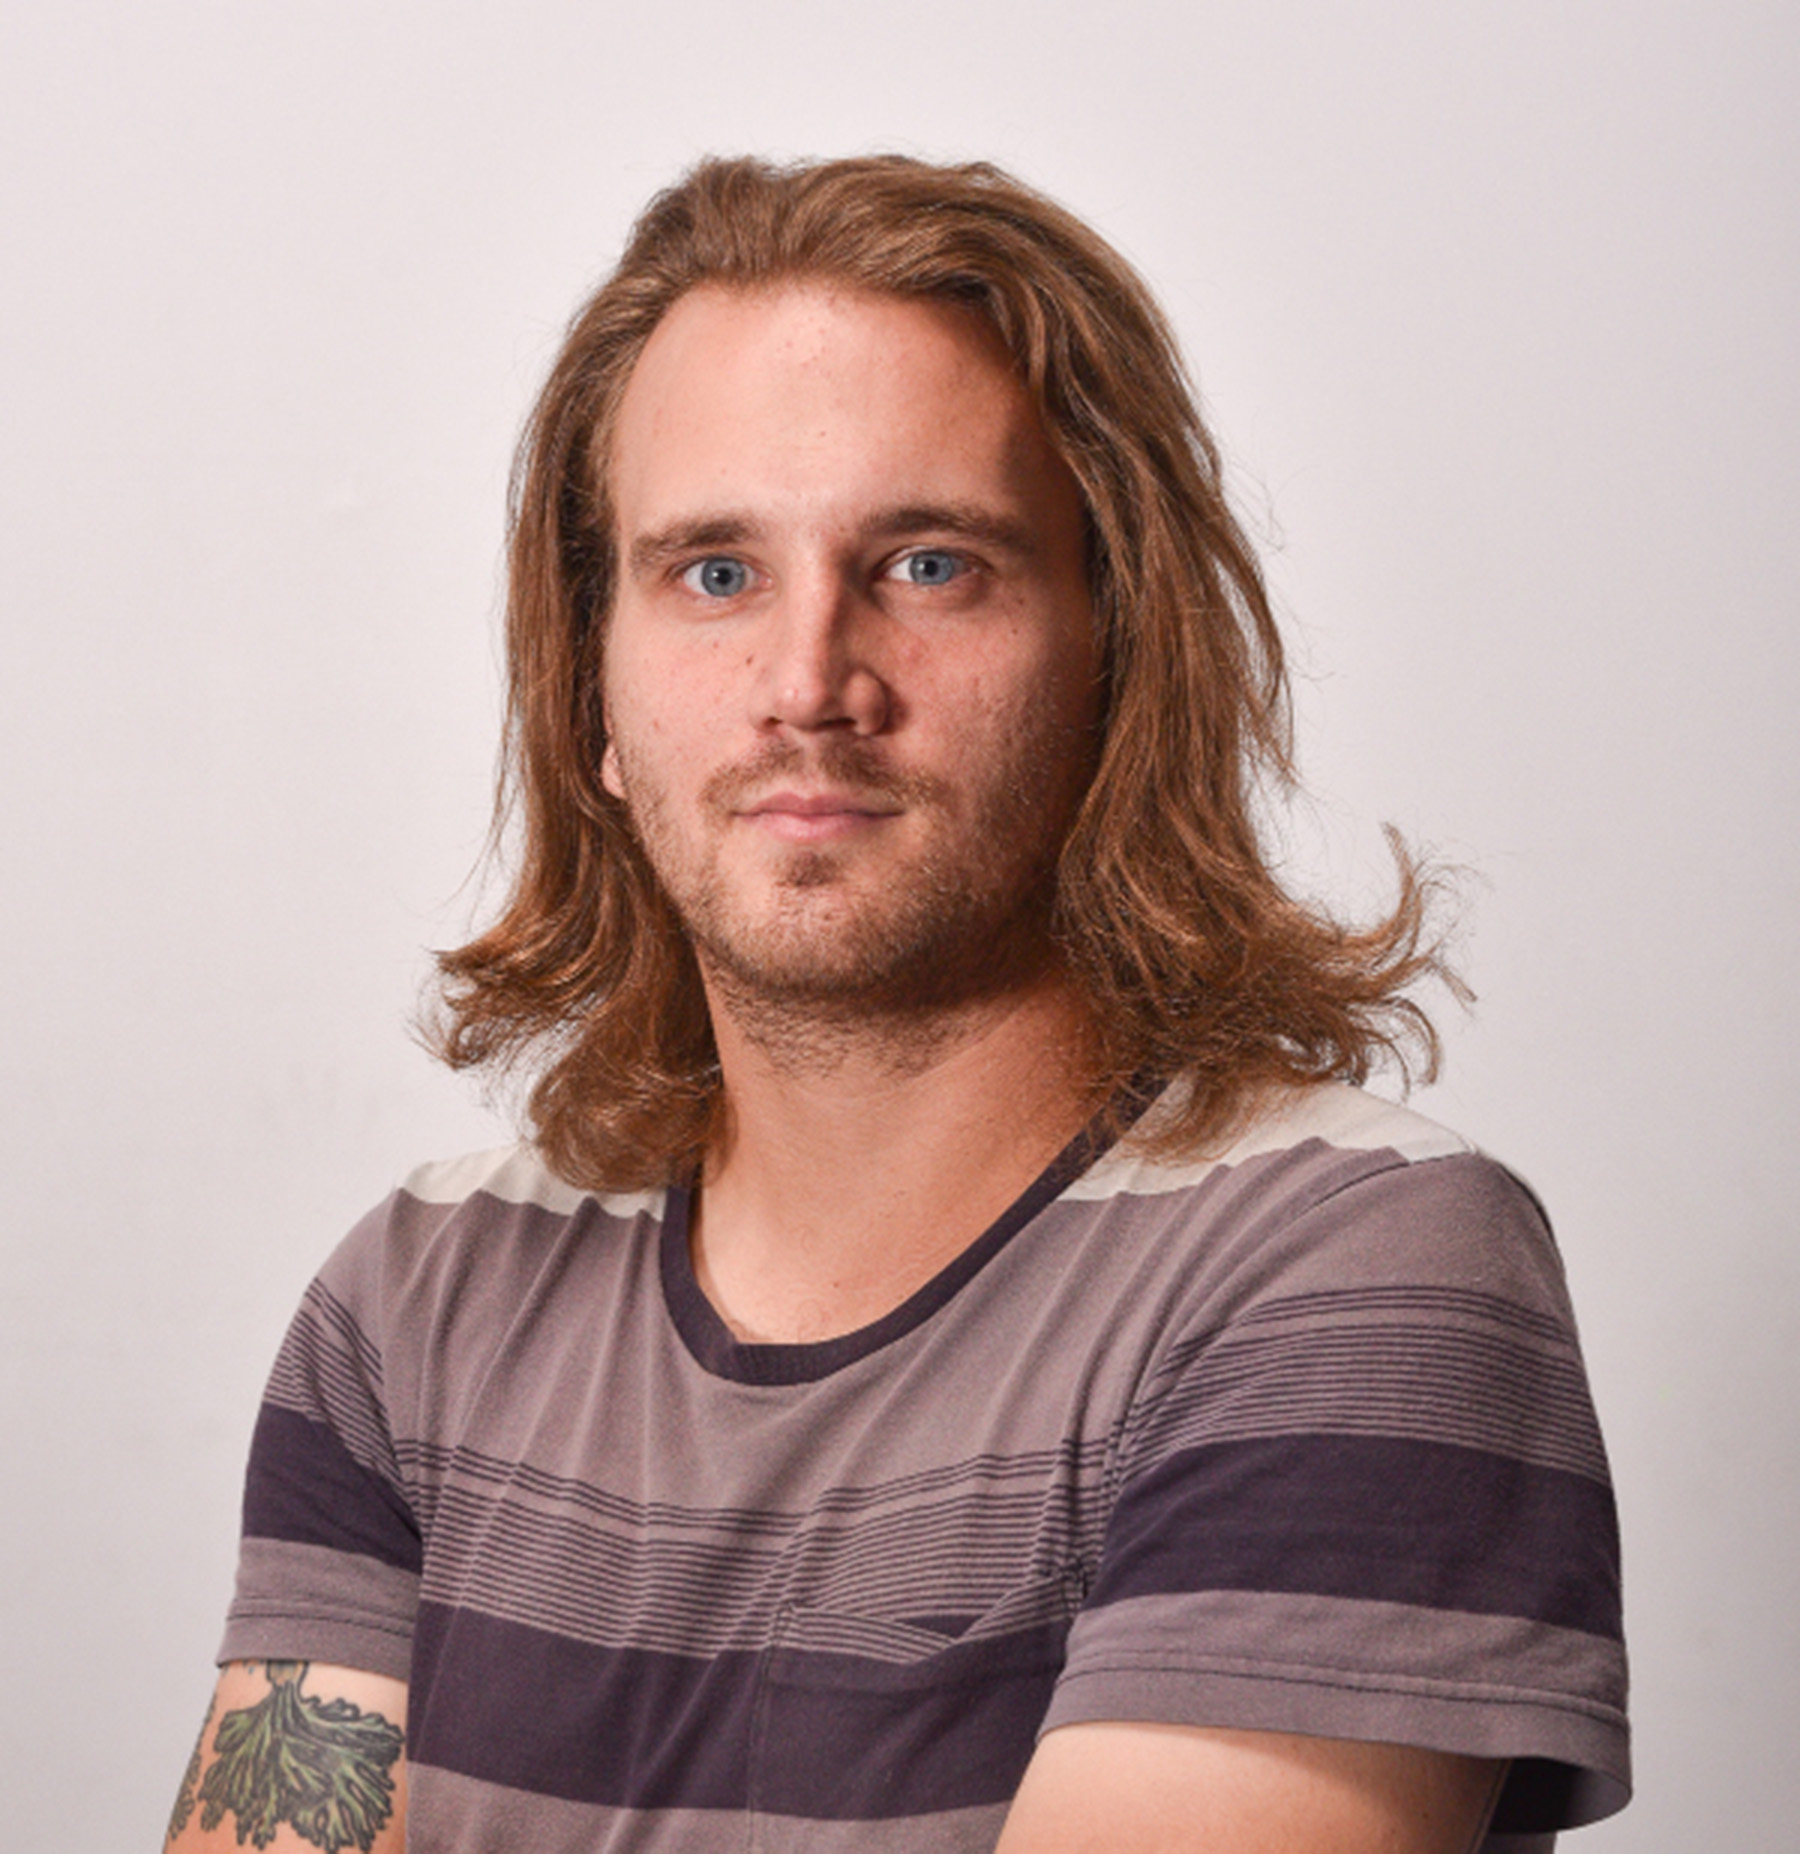 Matthew Hedgepath Smith